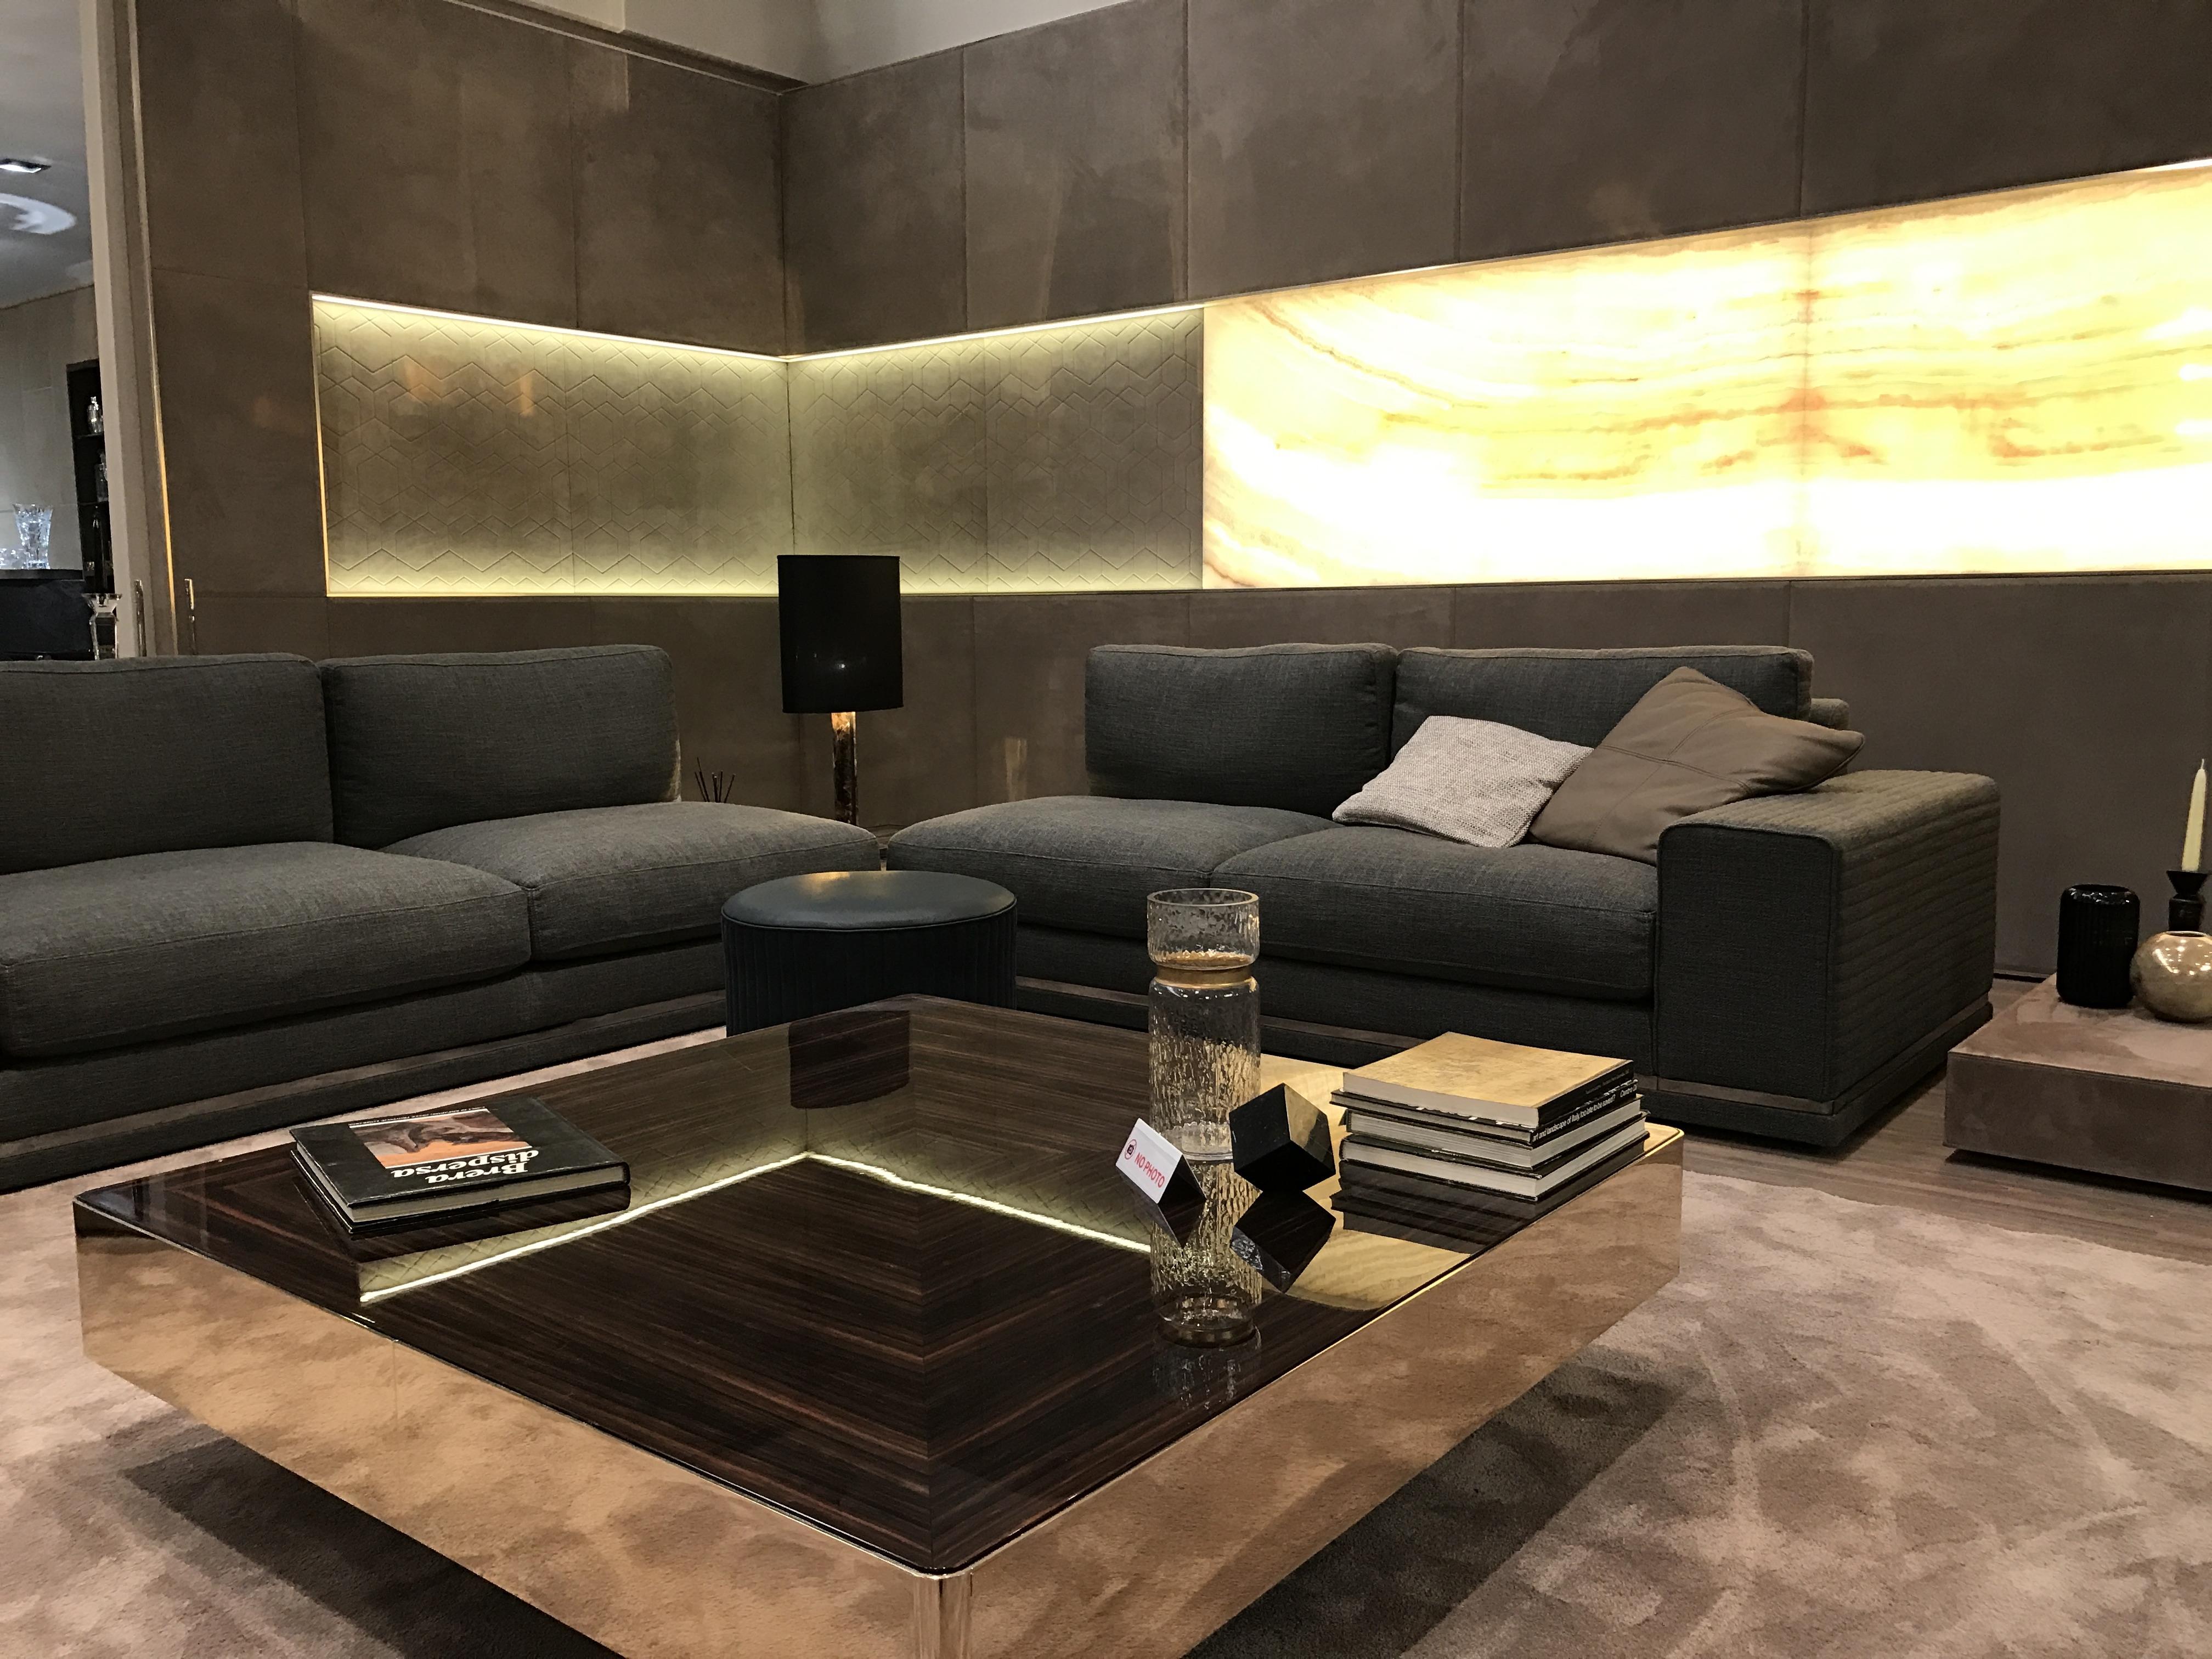 Luxury Italian Designer Cohen Sectional – Italian Designer & Luxury Inside Cohen Down 2 Piece Sectionals (View 10 of 25)